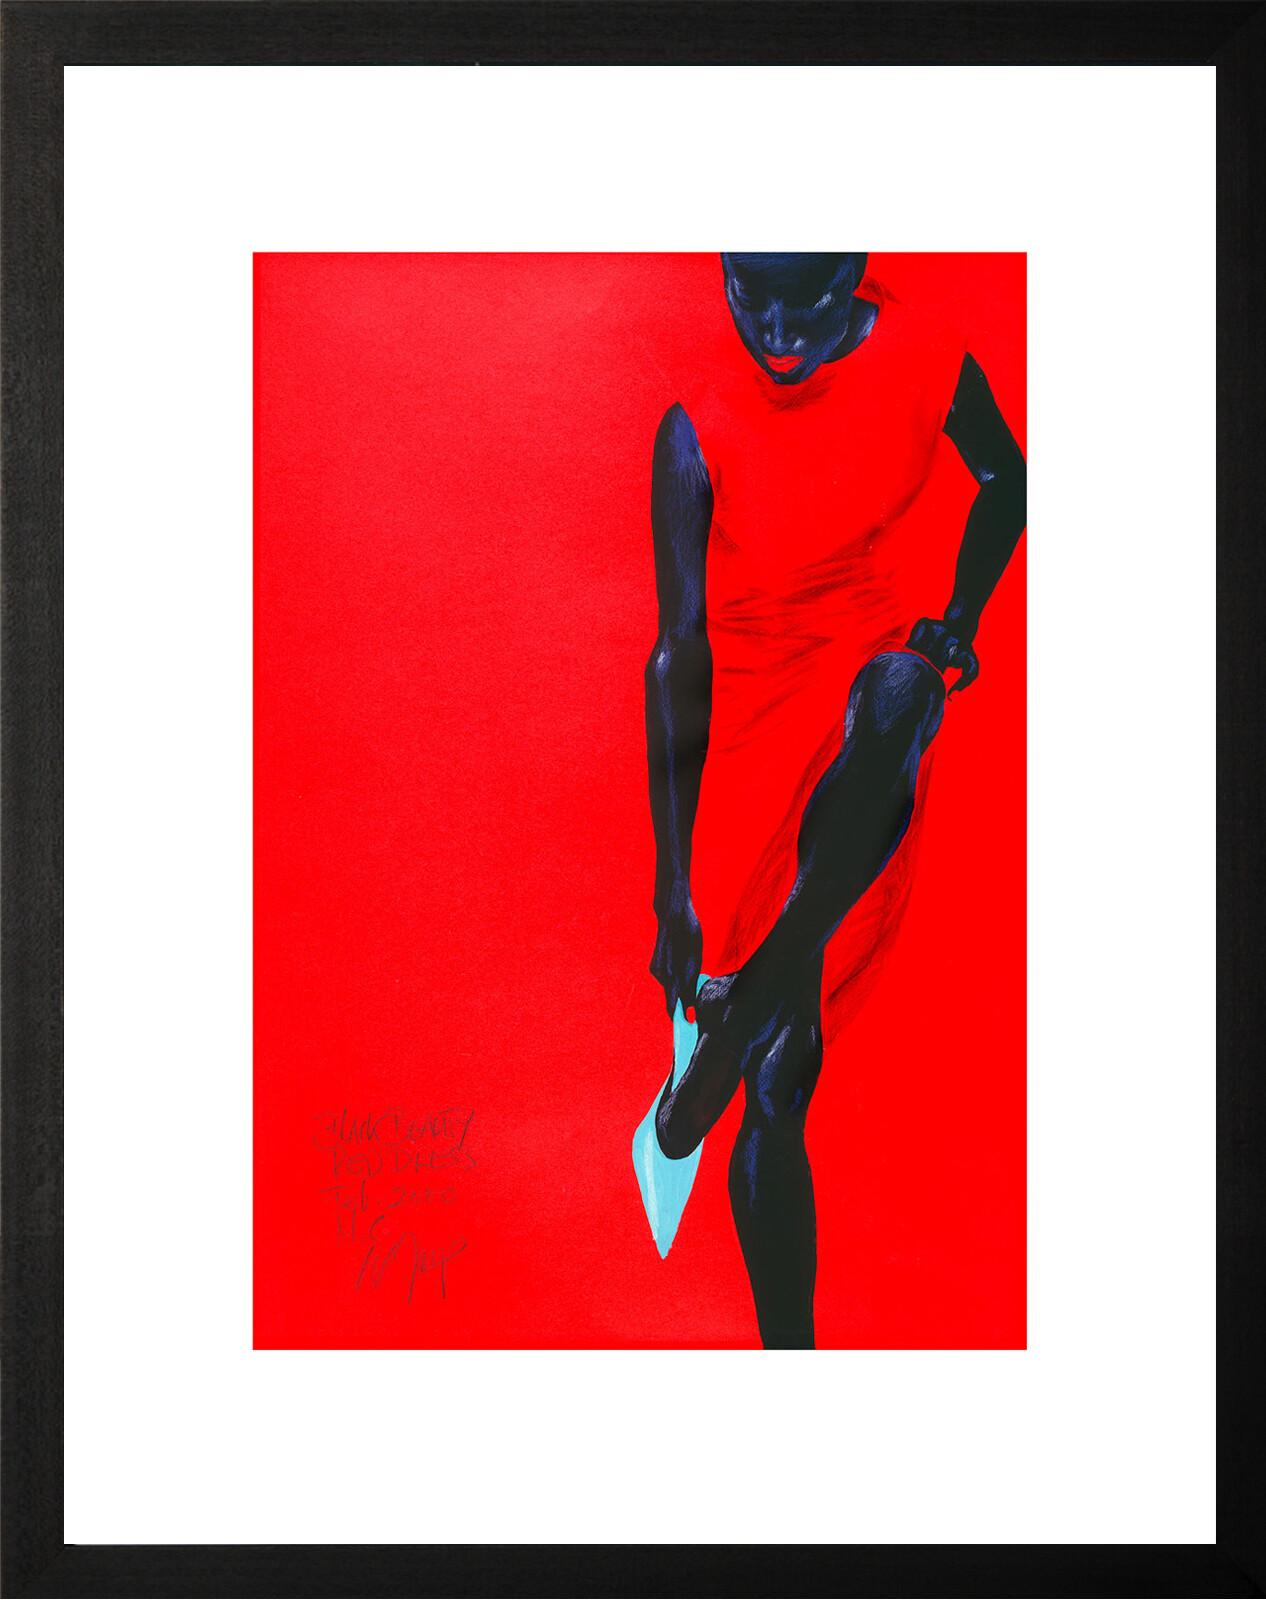 Black Beauty - Red Dress - Wolfgang Joop